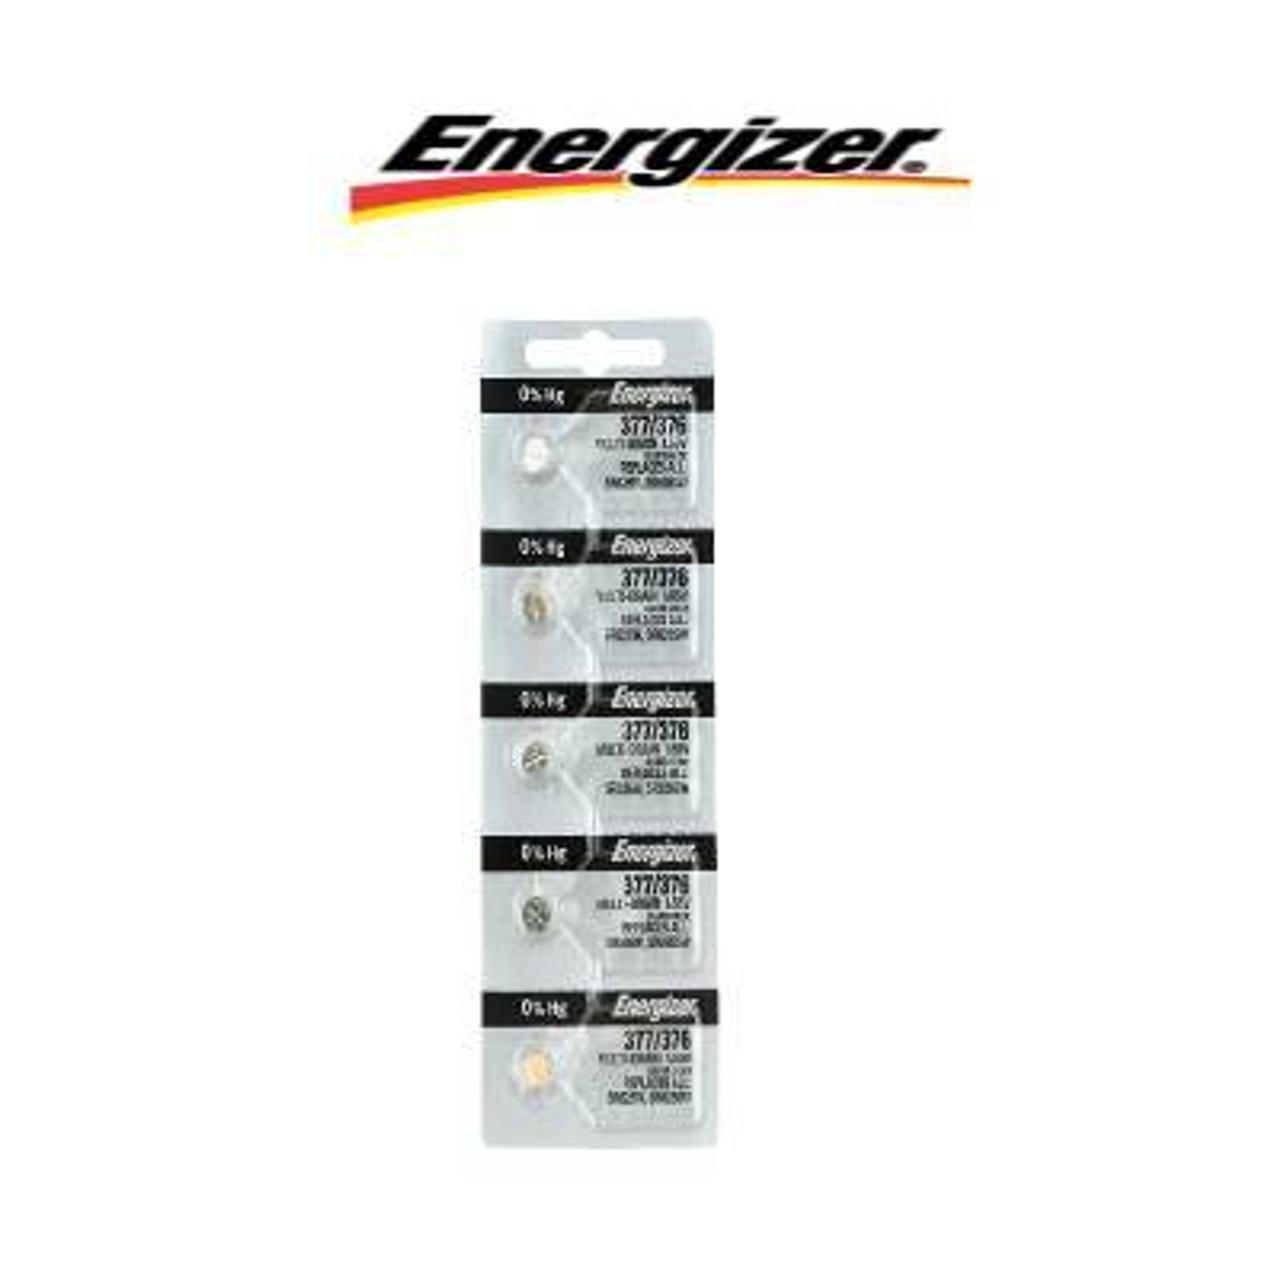 Energizer Brand